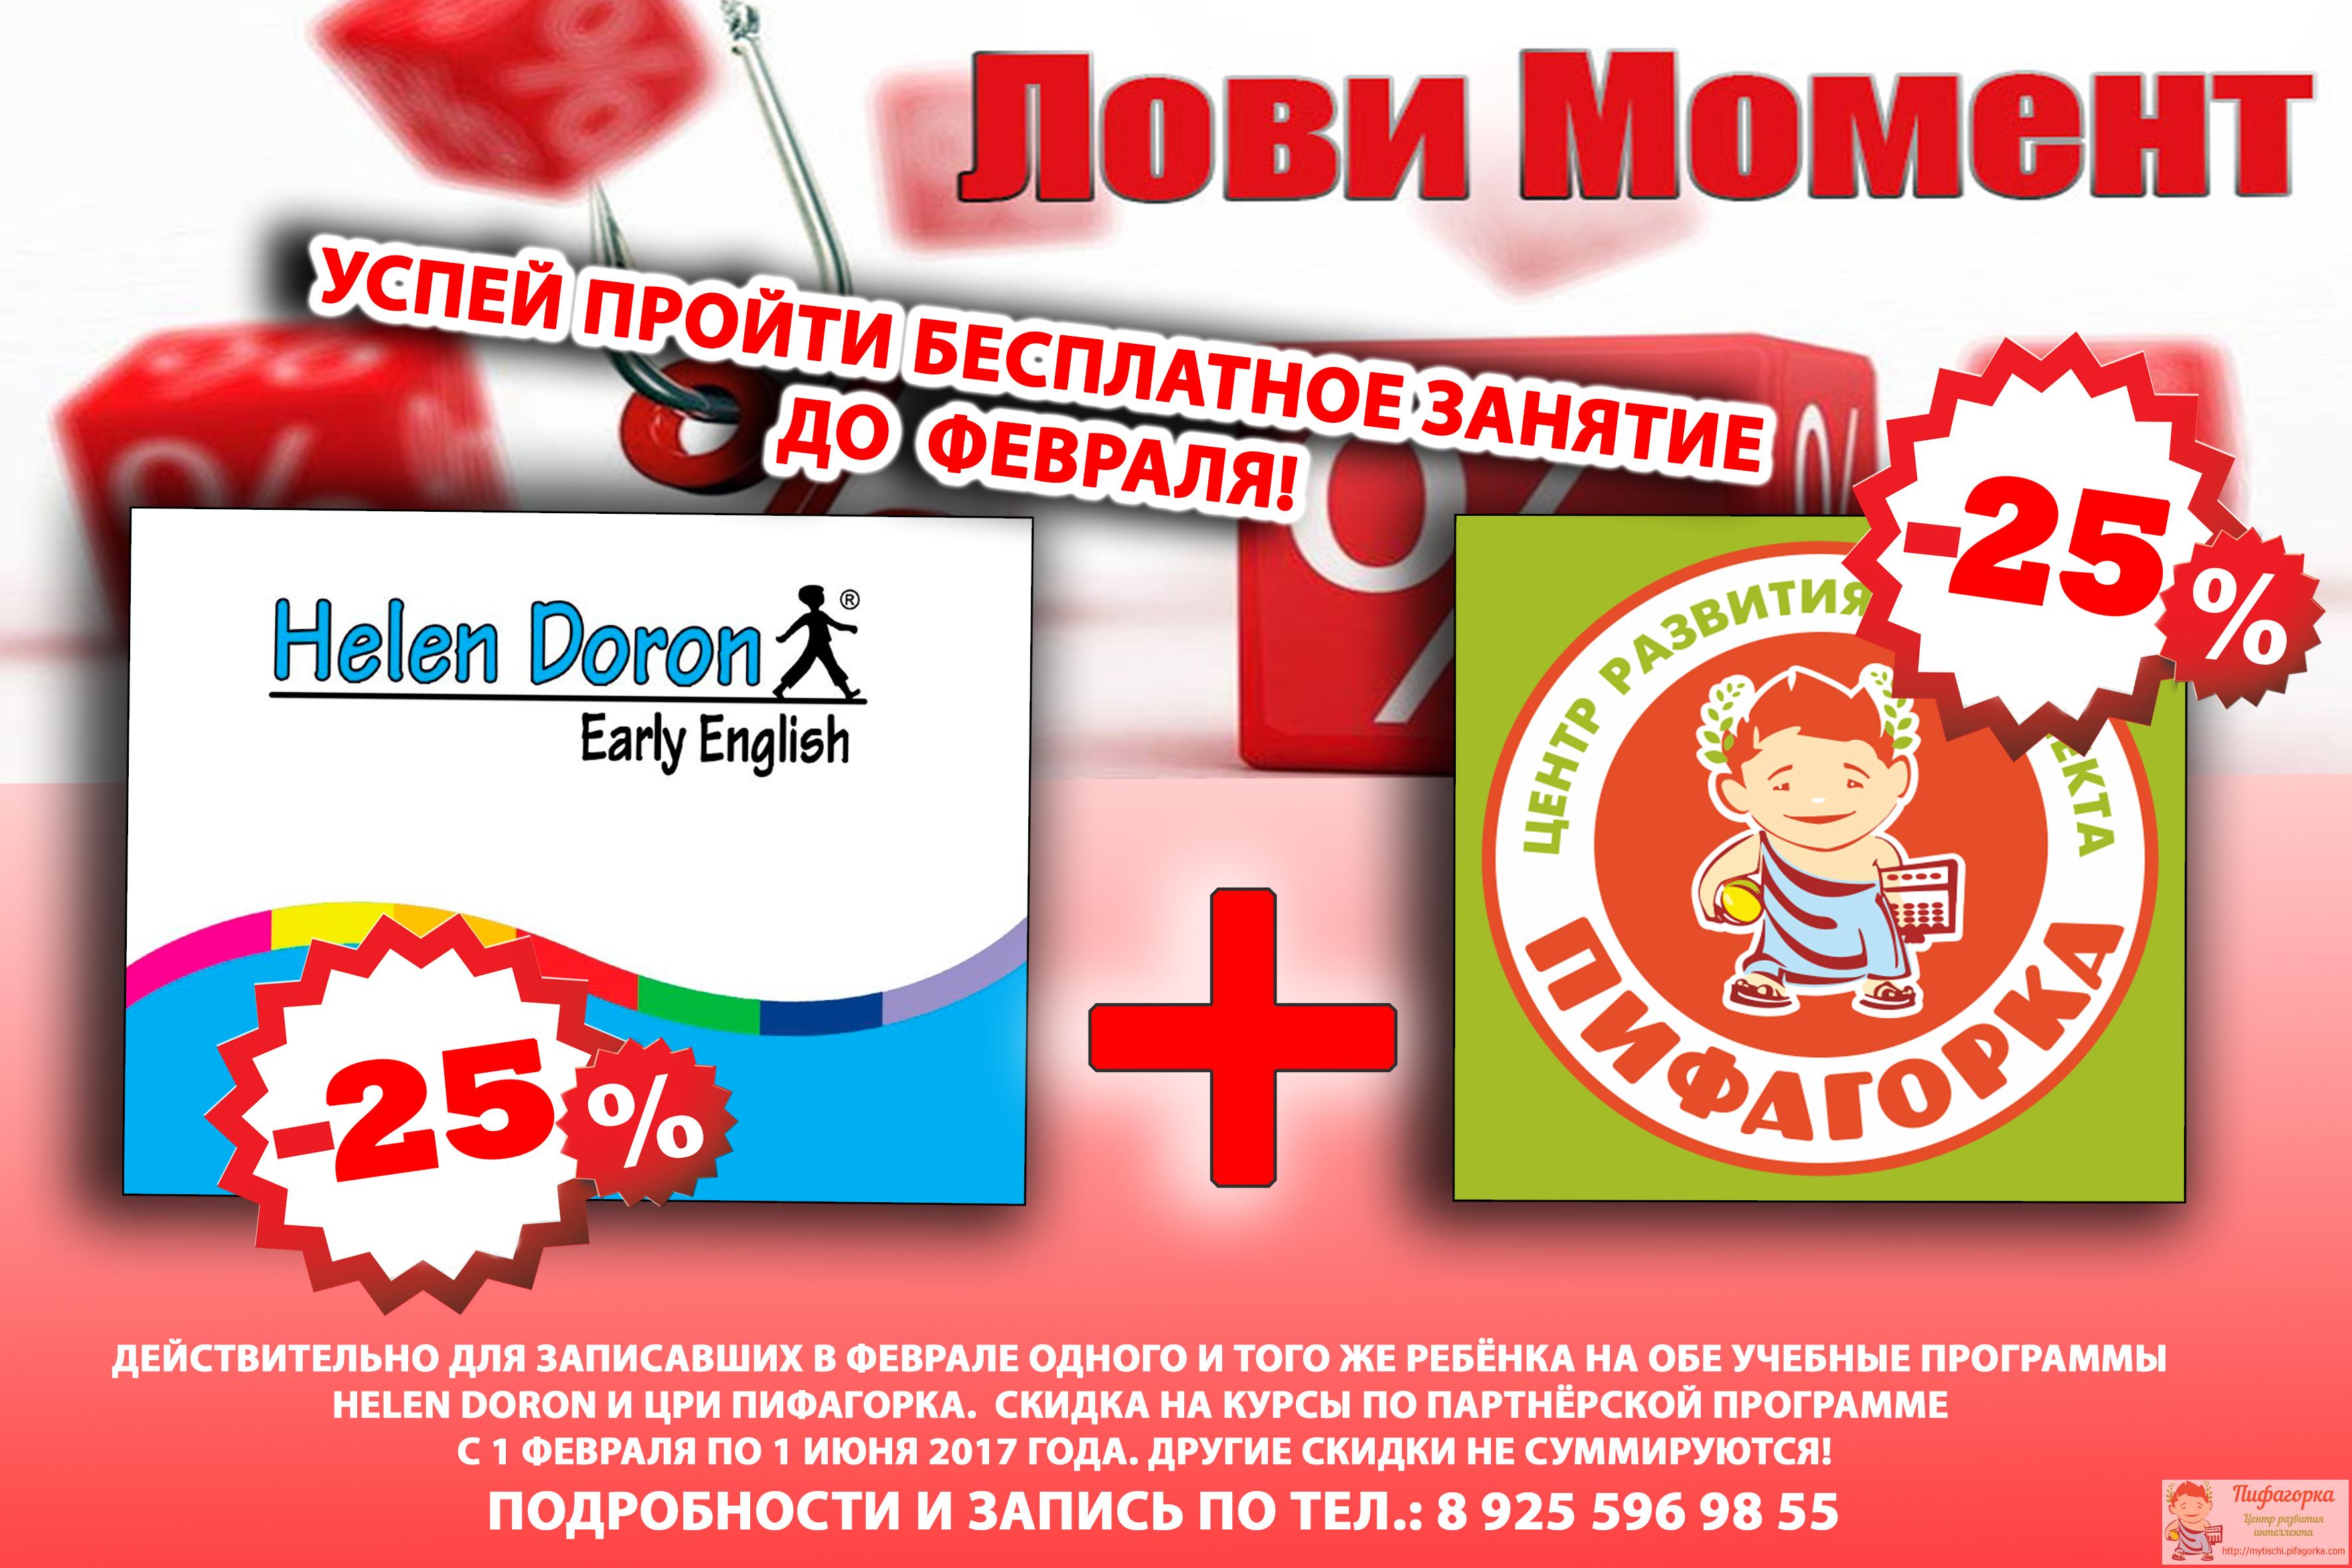 Пифагорка + Английский = Скидка 25%!